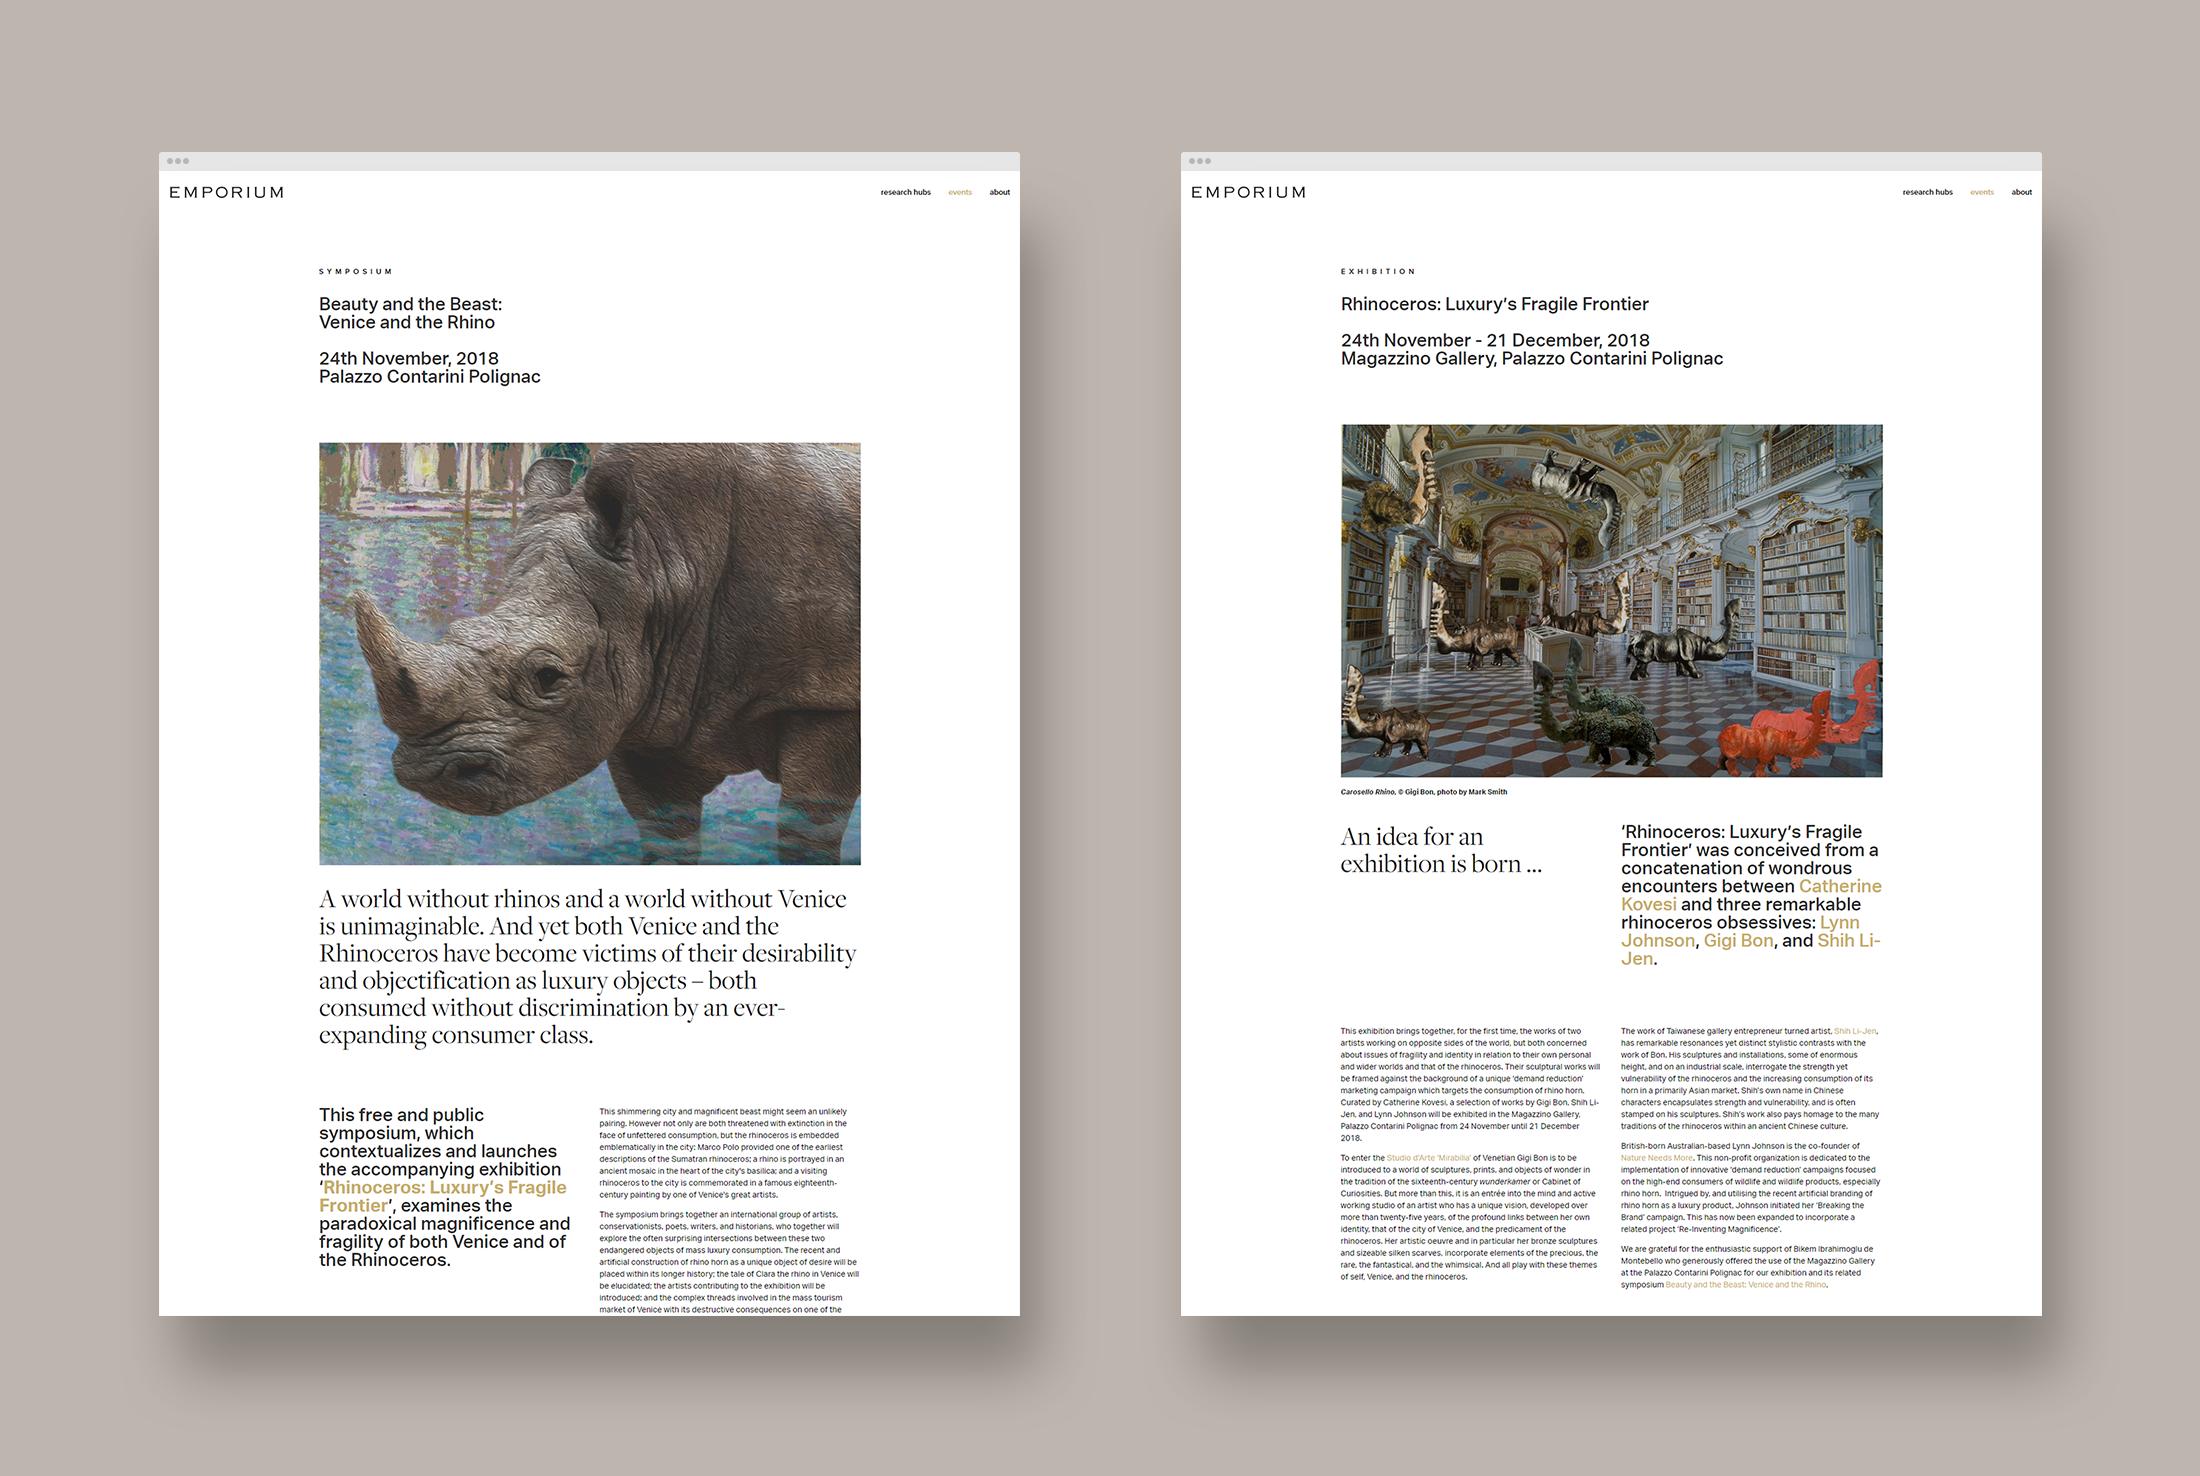 website design for Rhinoceros: Luxury's Fragile Frontier